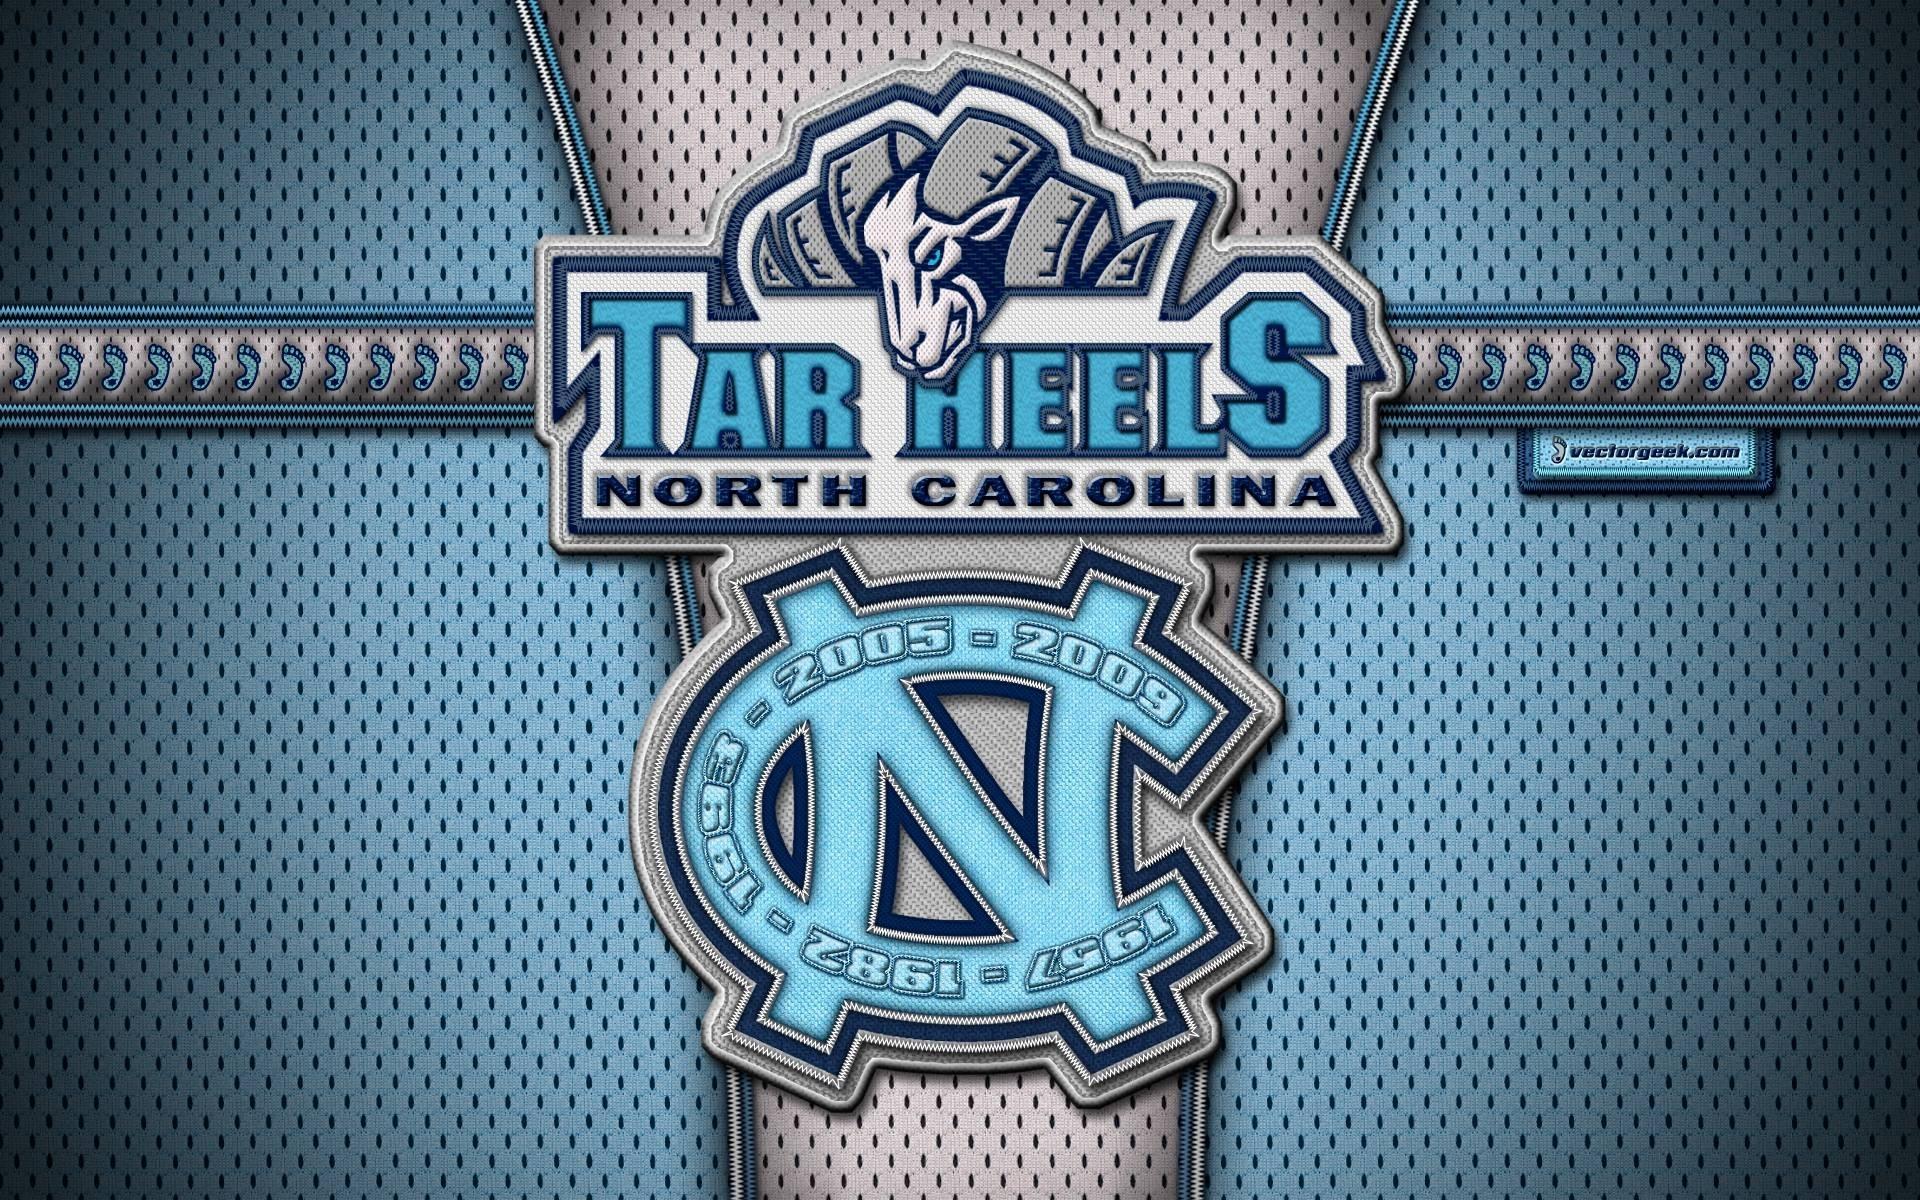 10 New North Carolina Basketball Wallpaper FULL HD 1080p For PC Desktop